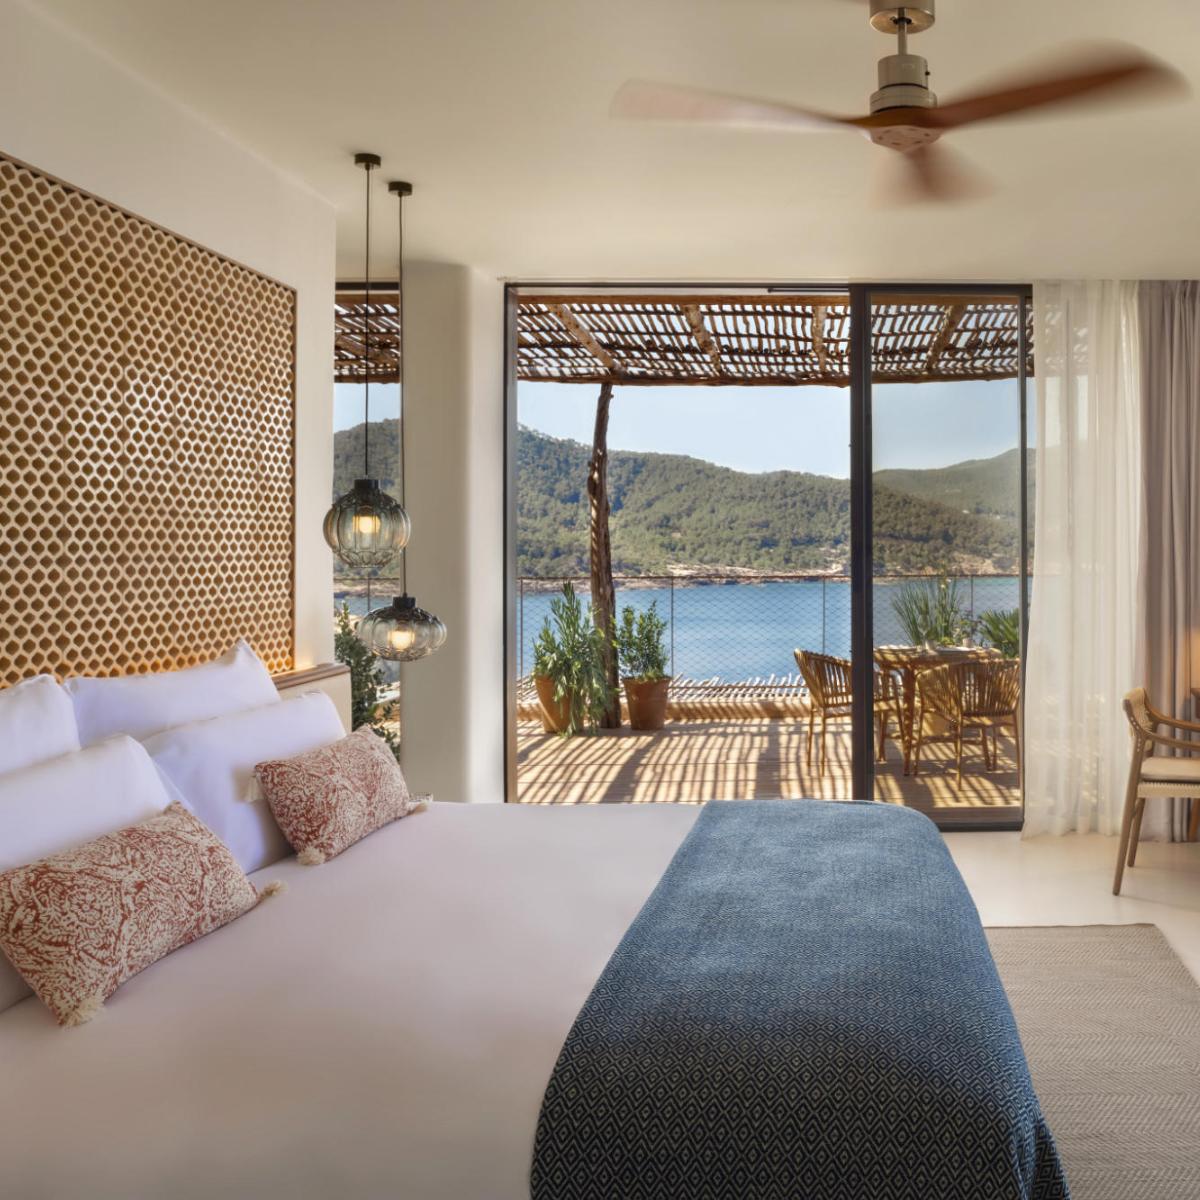 Six Senses Ibiza Room with Terrace